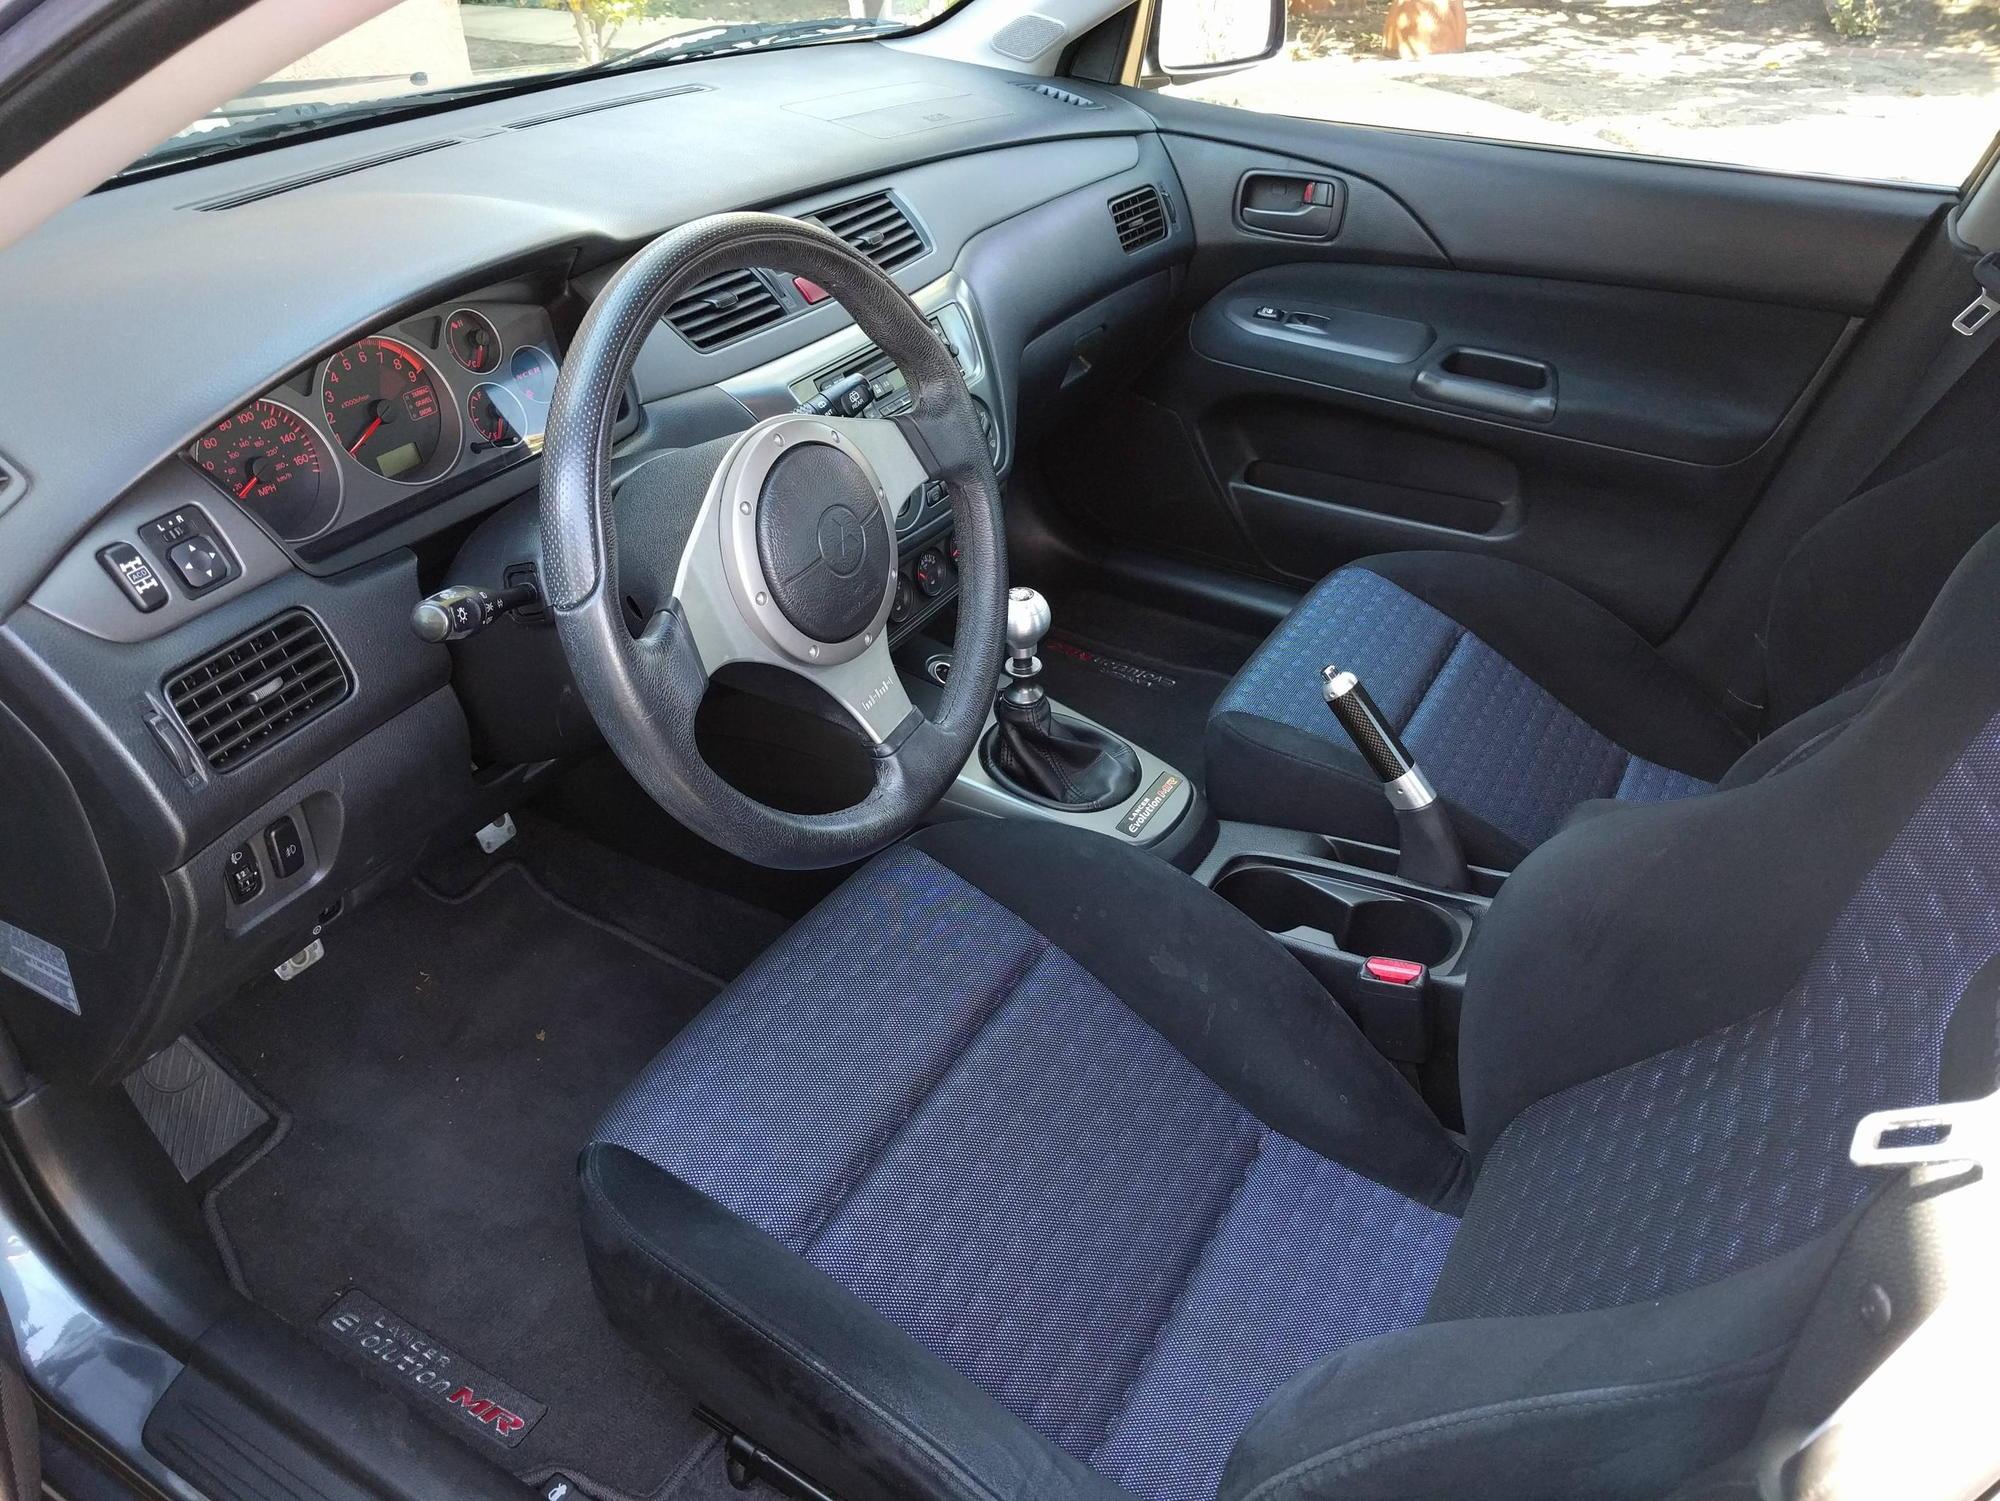 astral's Mitsubishi Evo VIII Build - Miata Turbo Forum